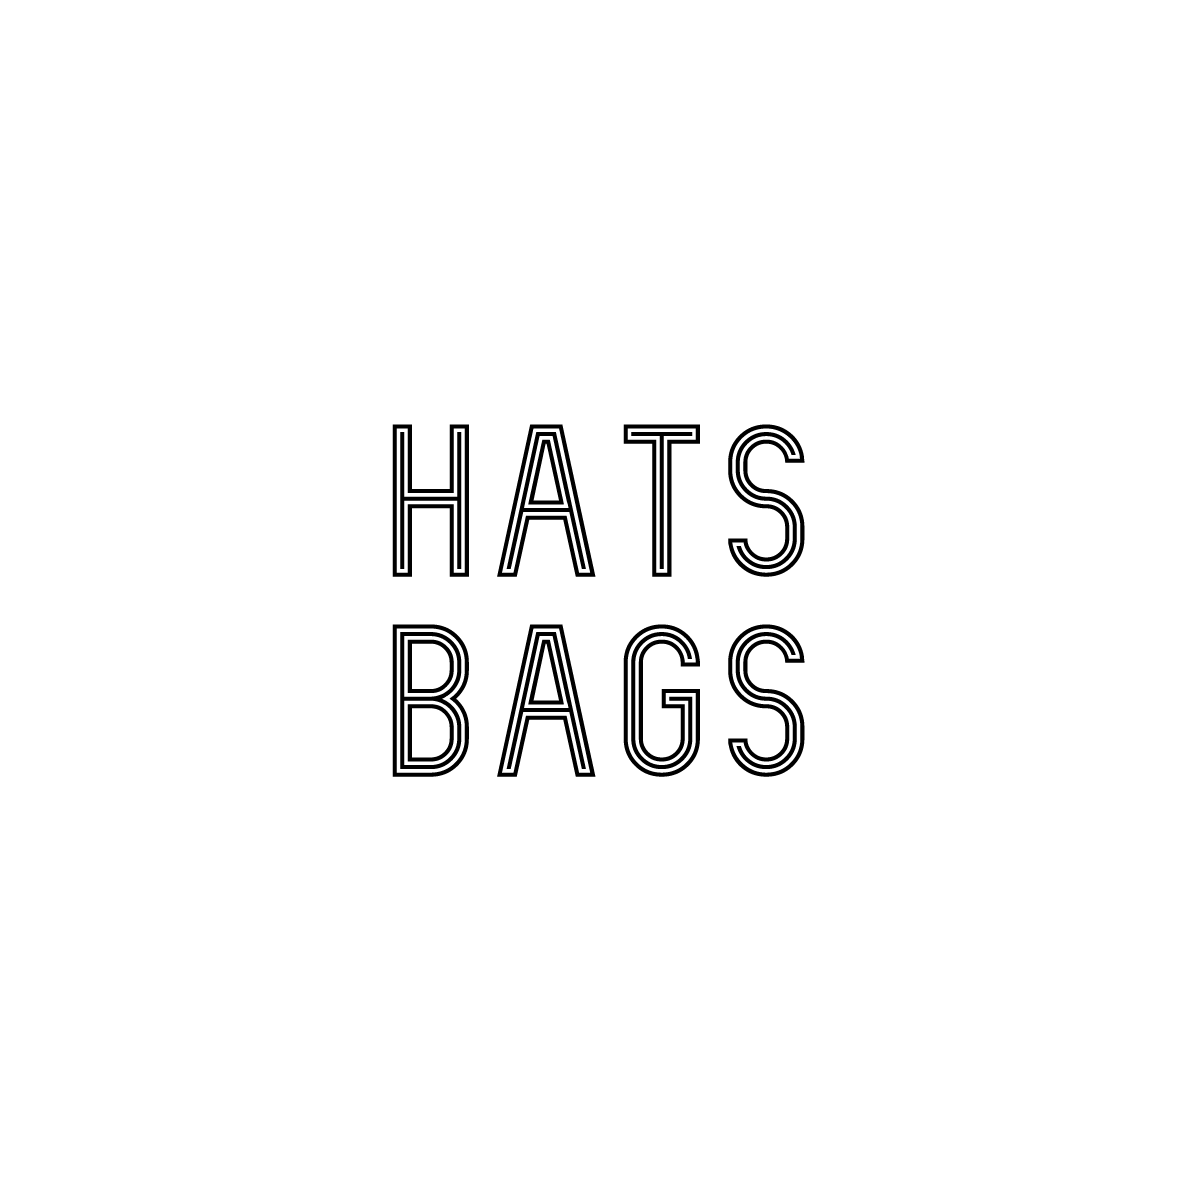 Hats | Bags